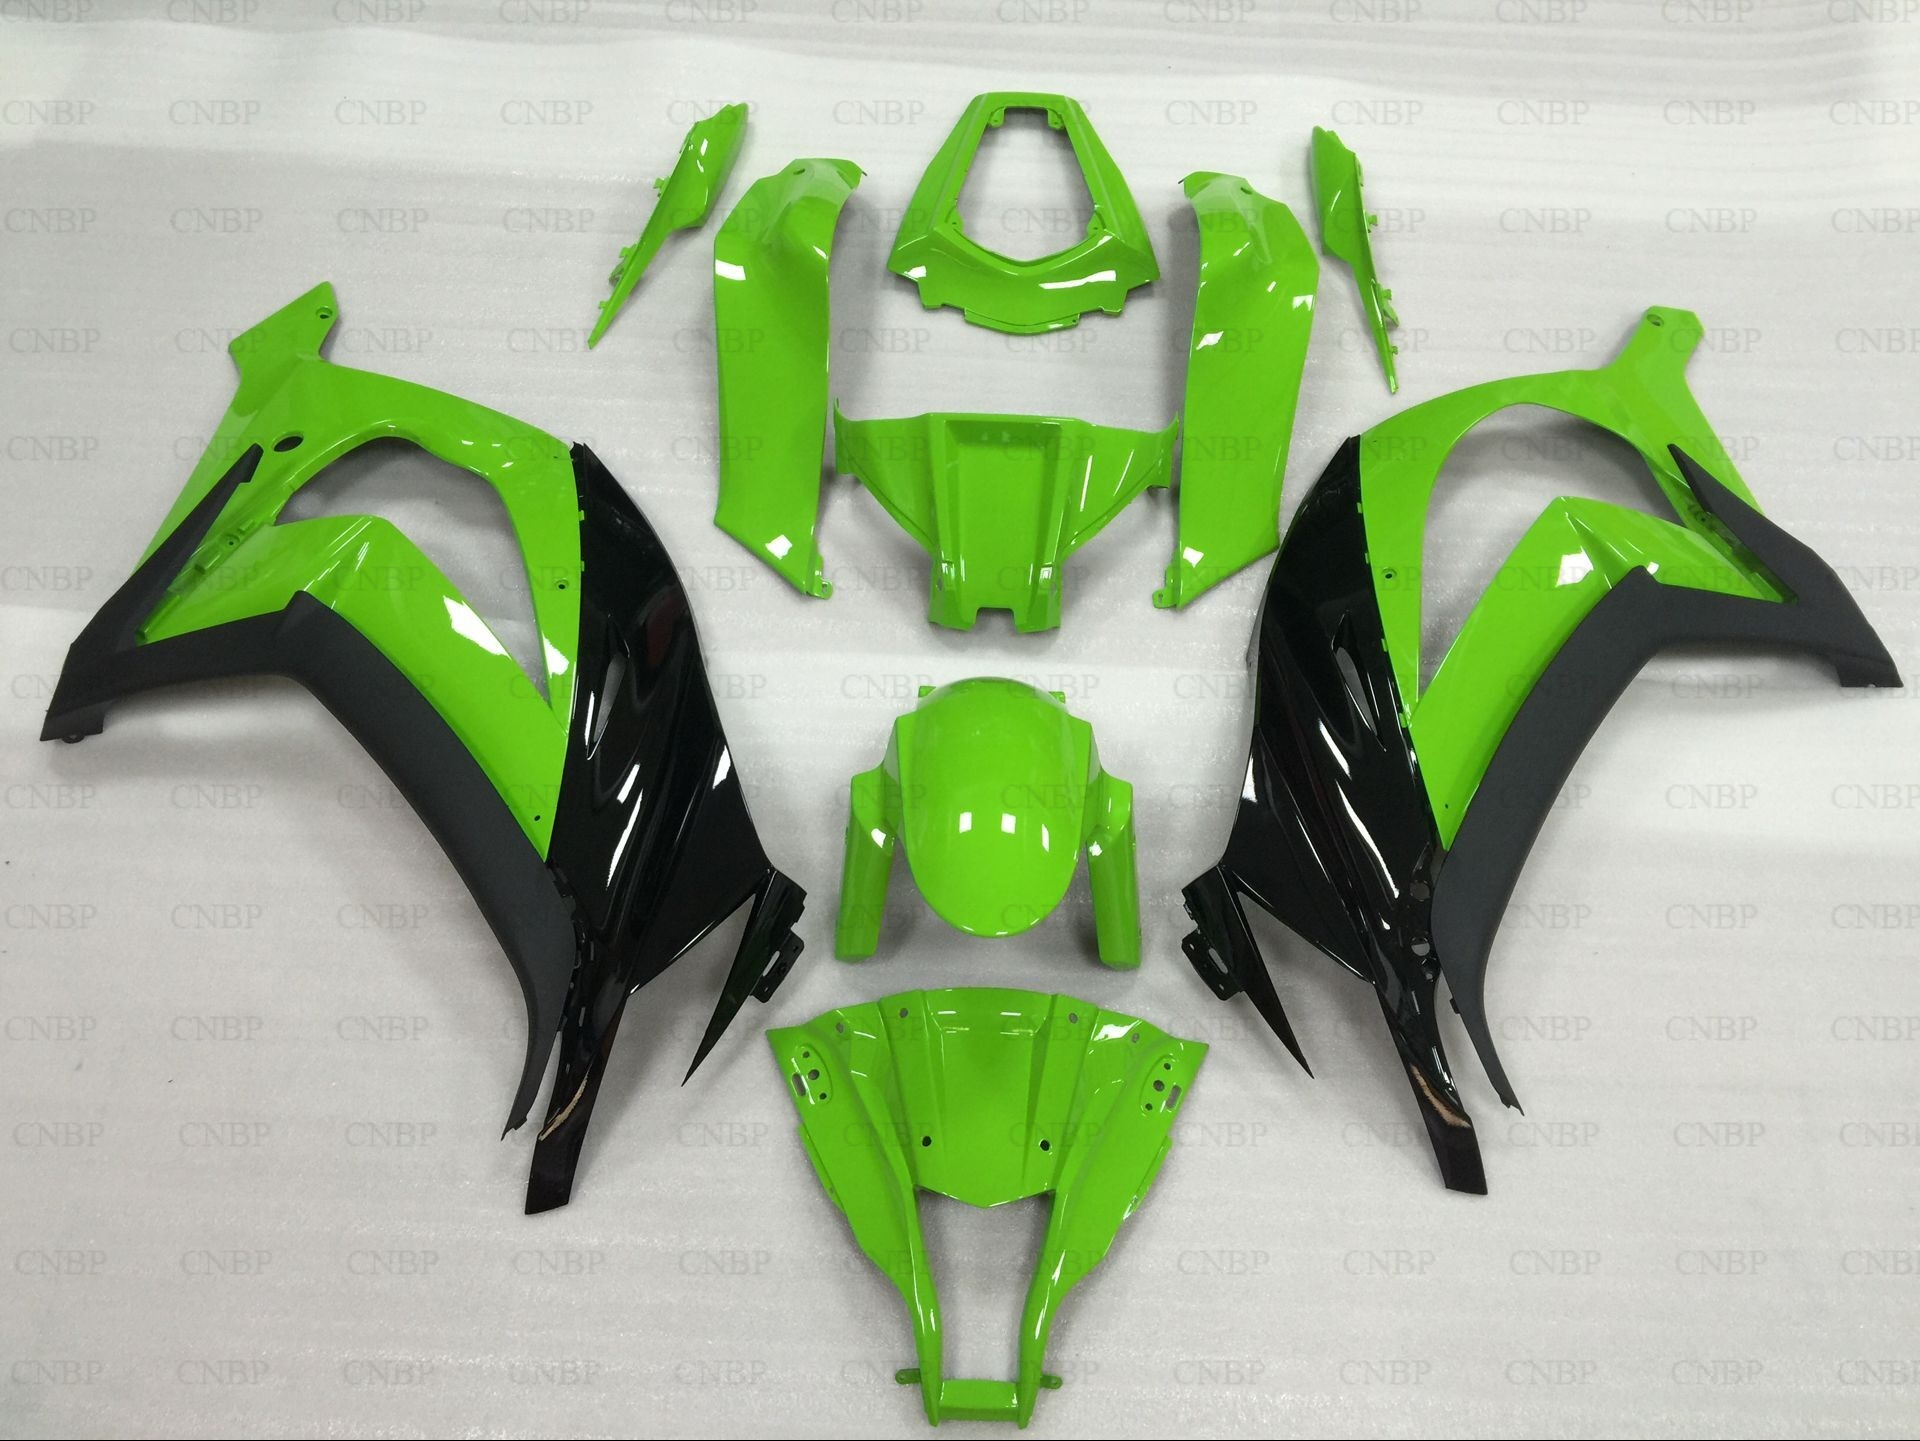 Fairing for Kawasaki ZX10r 2014 Abs Fairing ZX-10r 2013 2011 - 2015 Green Black Fairing ZX-10r 2015 hot sales zx 10r 2011 2012 2013 2014 2015 fairing set for kawasaki ninja zx10r zx 10r 11 15 body green kit injection molding